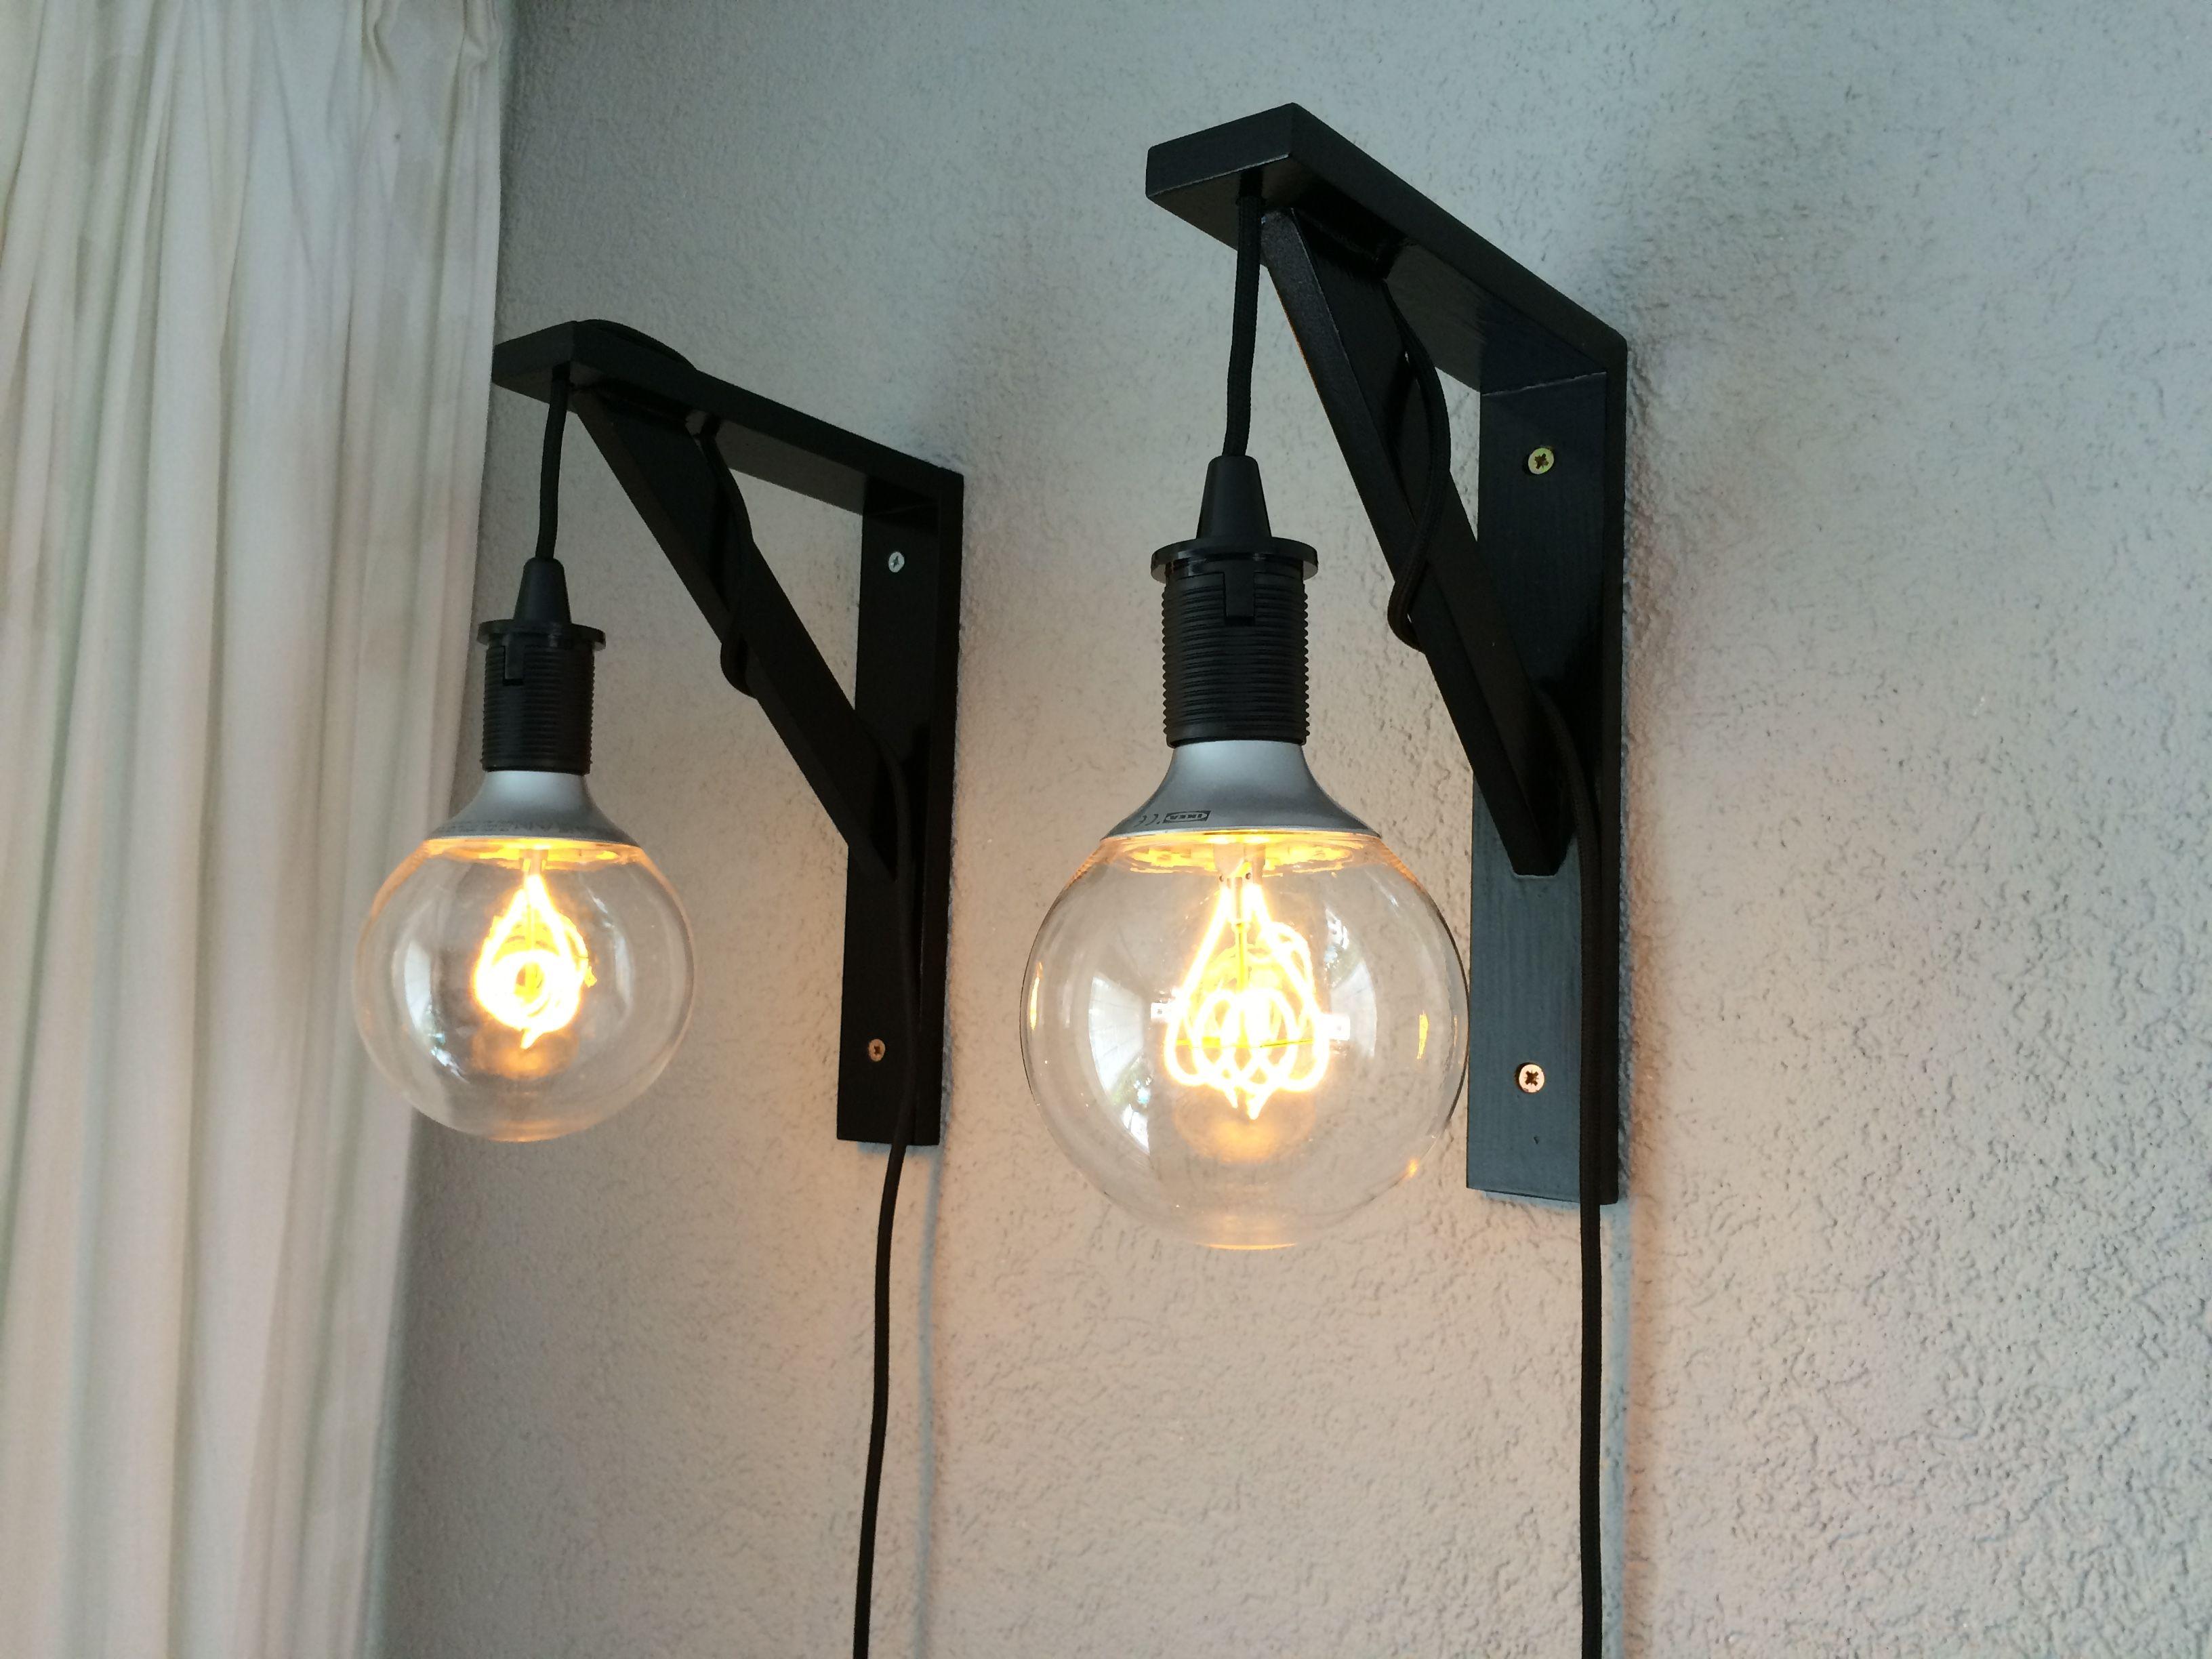 lampe de salon ikea finest donnez un ct lunaire cette lampe fado duikea with lampe de salon. Black Bedroom Furniture Sets. Home Design Ideas